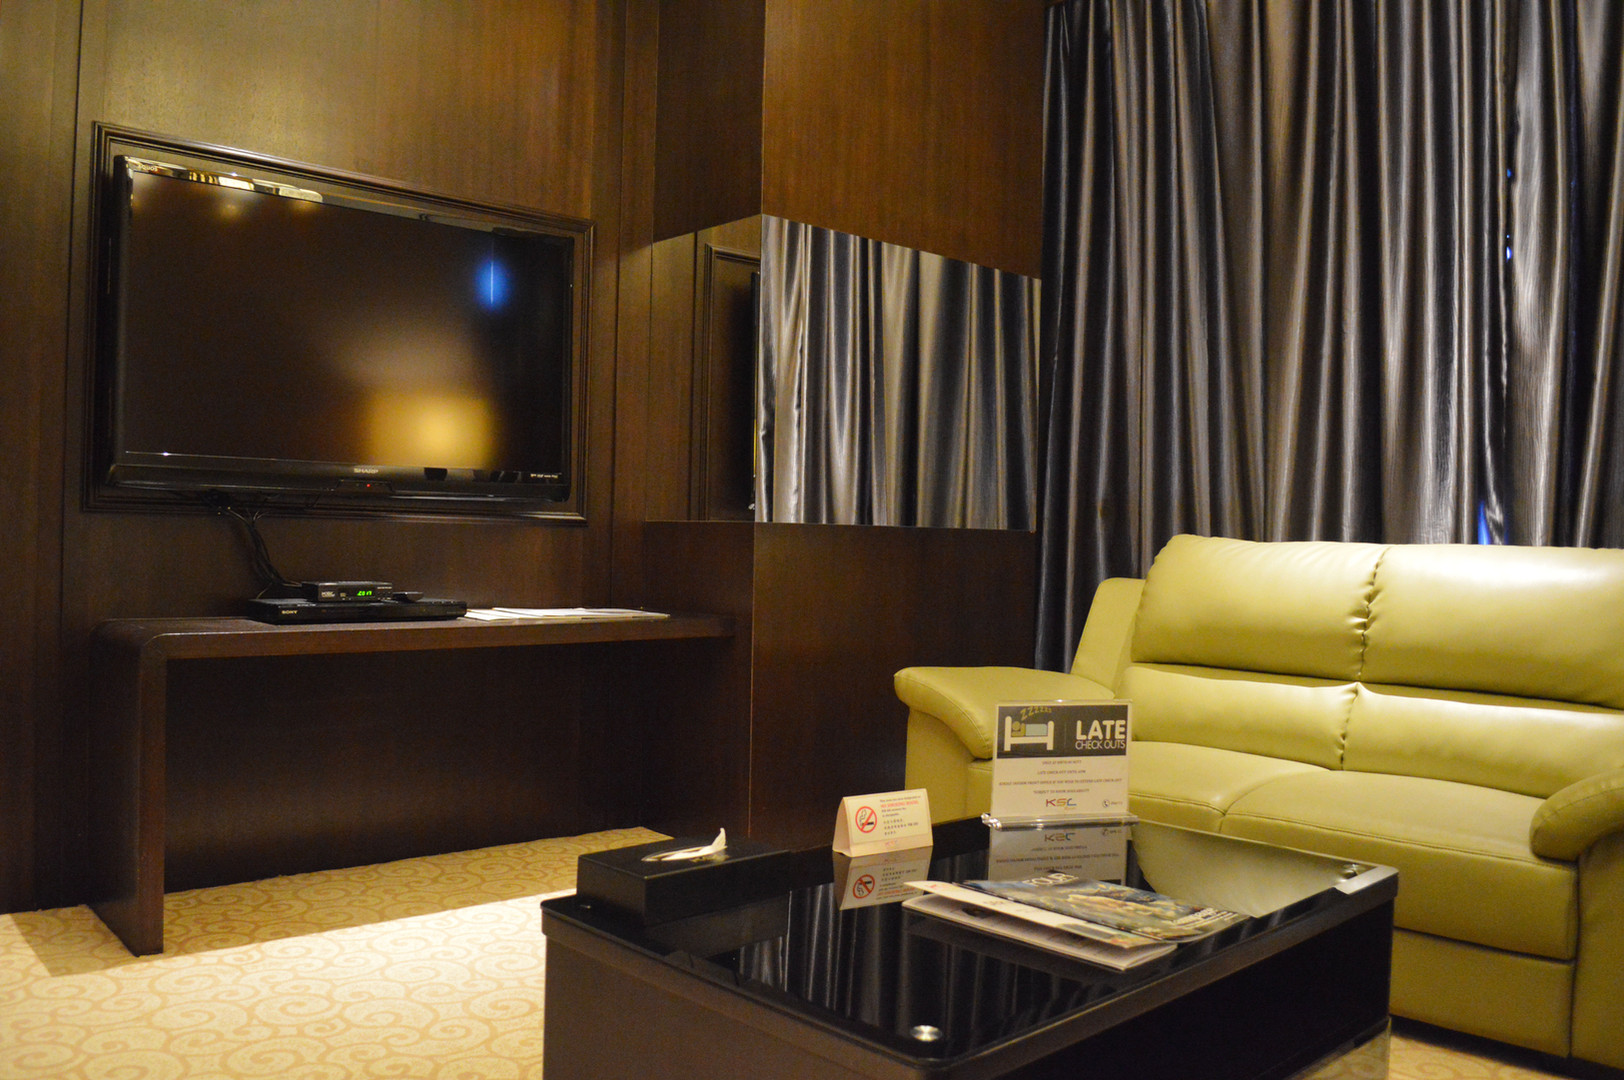 KSL Resort Hotel Room Interior Carpentry Works